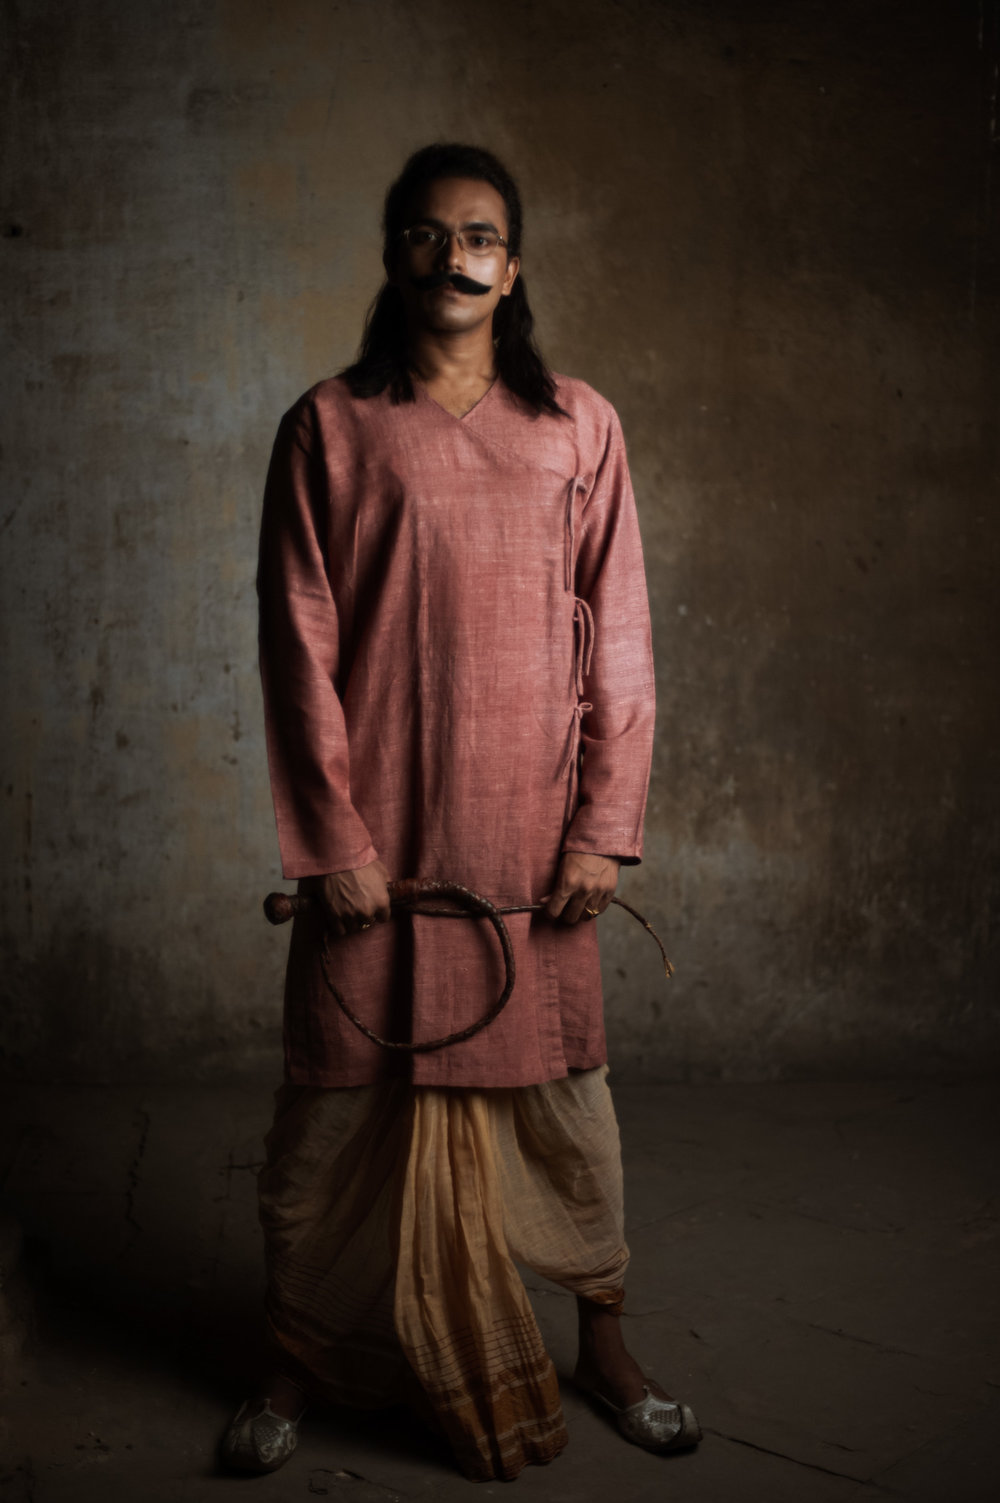 12_Chhandak Pradhan-fashion-Ruins and a Requiem-vintage_feudal_Indian_royal_portrait.jpg